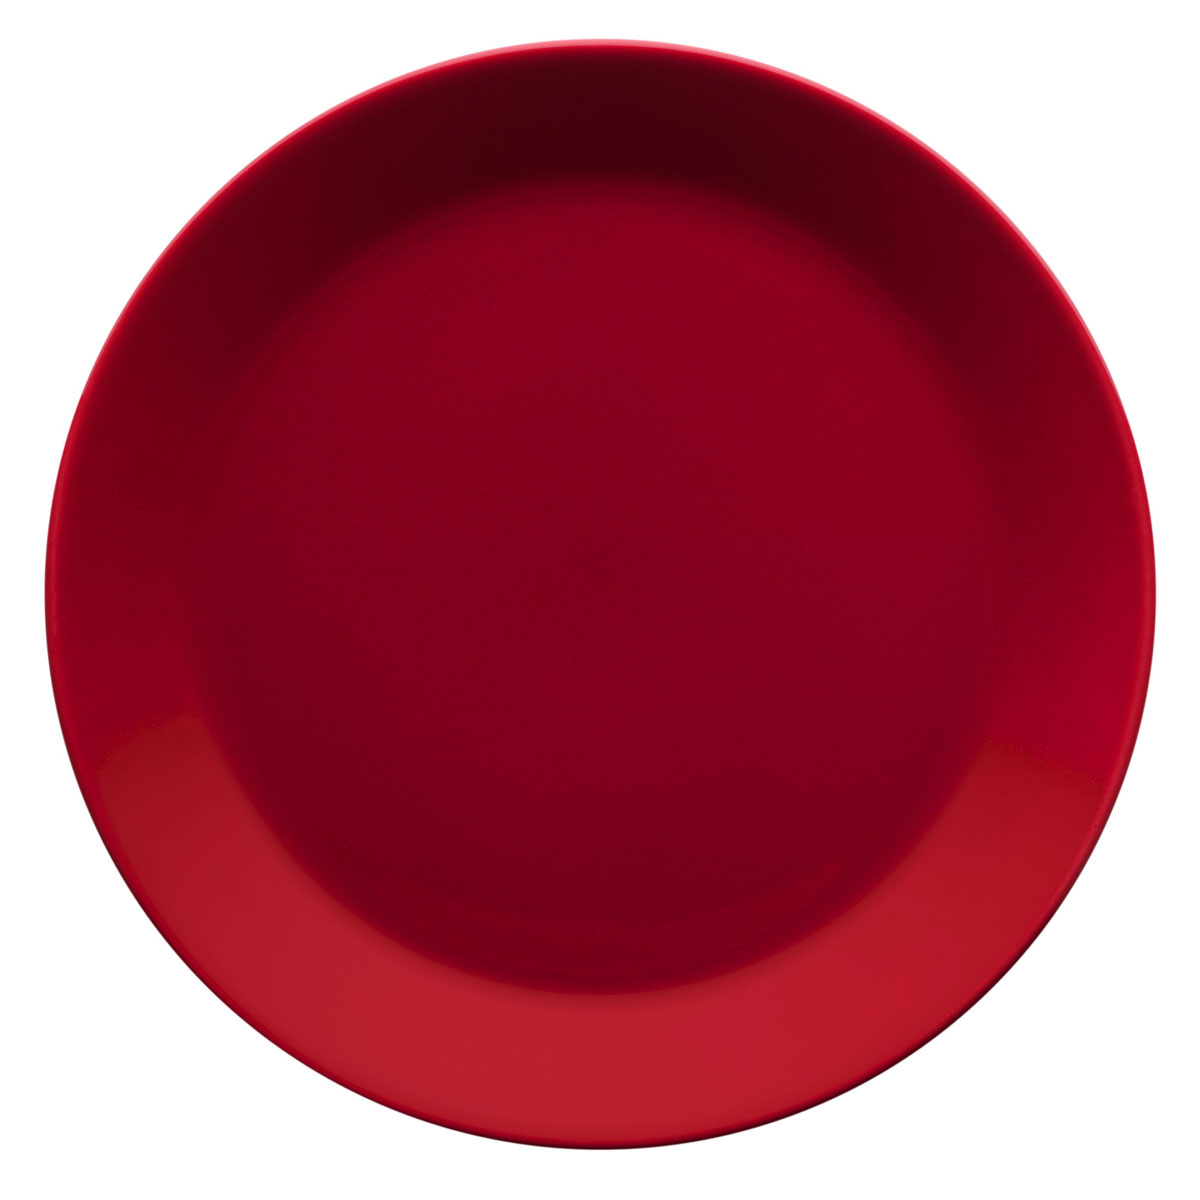 "Iittala Teema Salad Plate 8.5"" Red"